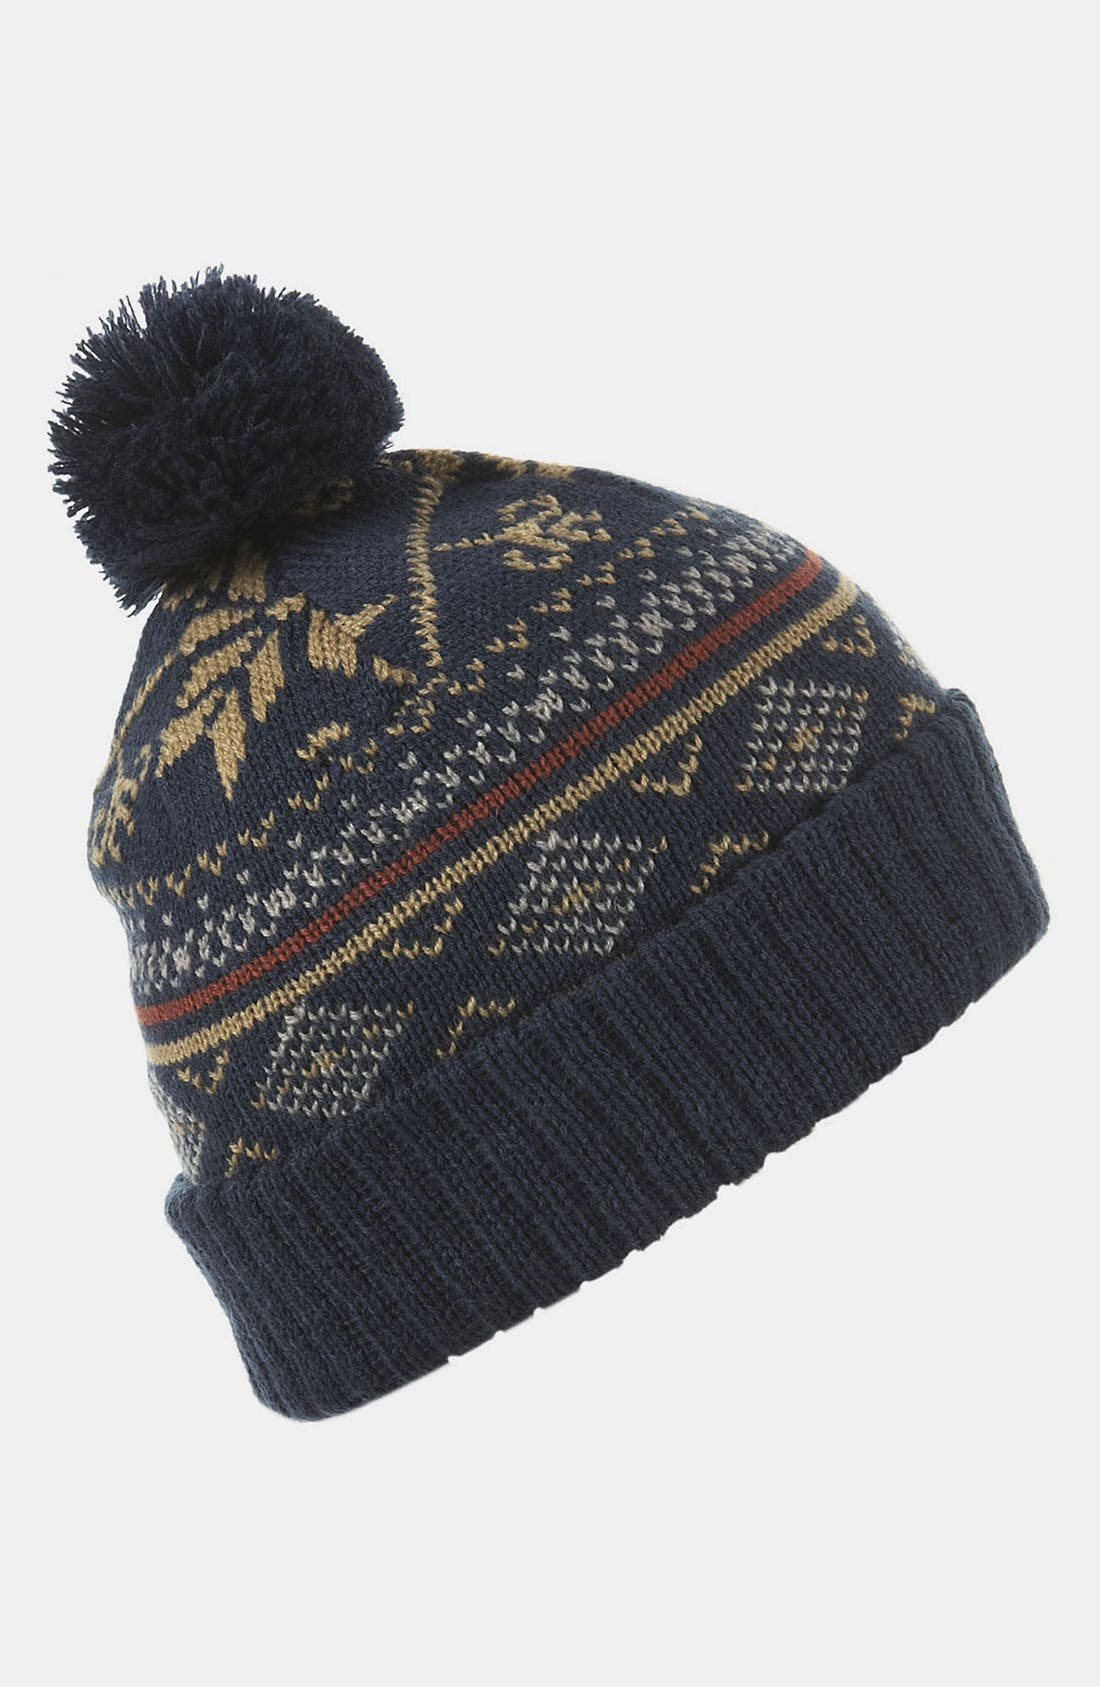 Alternate Image 1 Selected - Topman Patterned Knit Cap